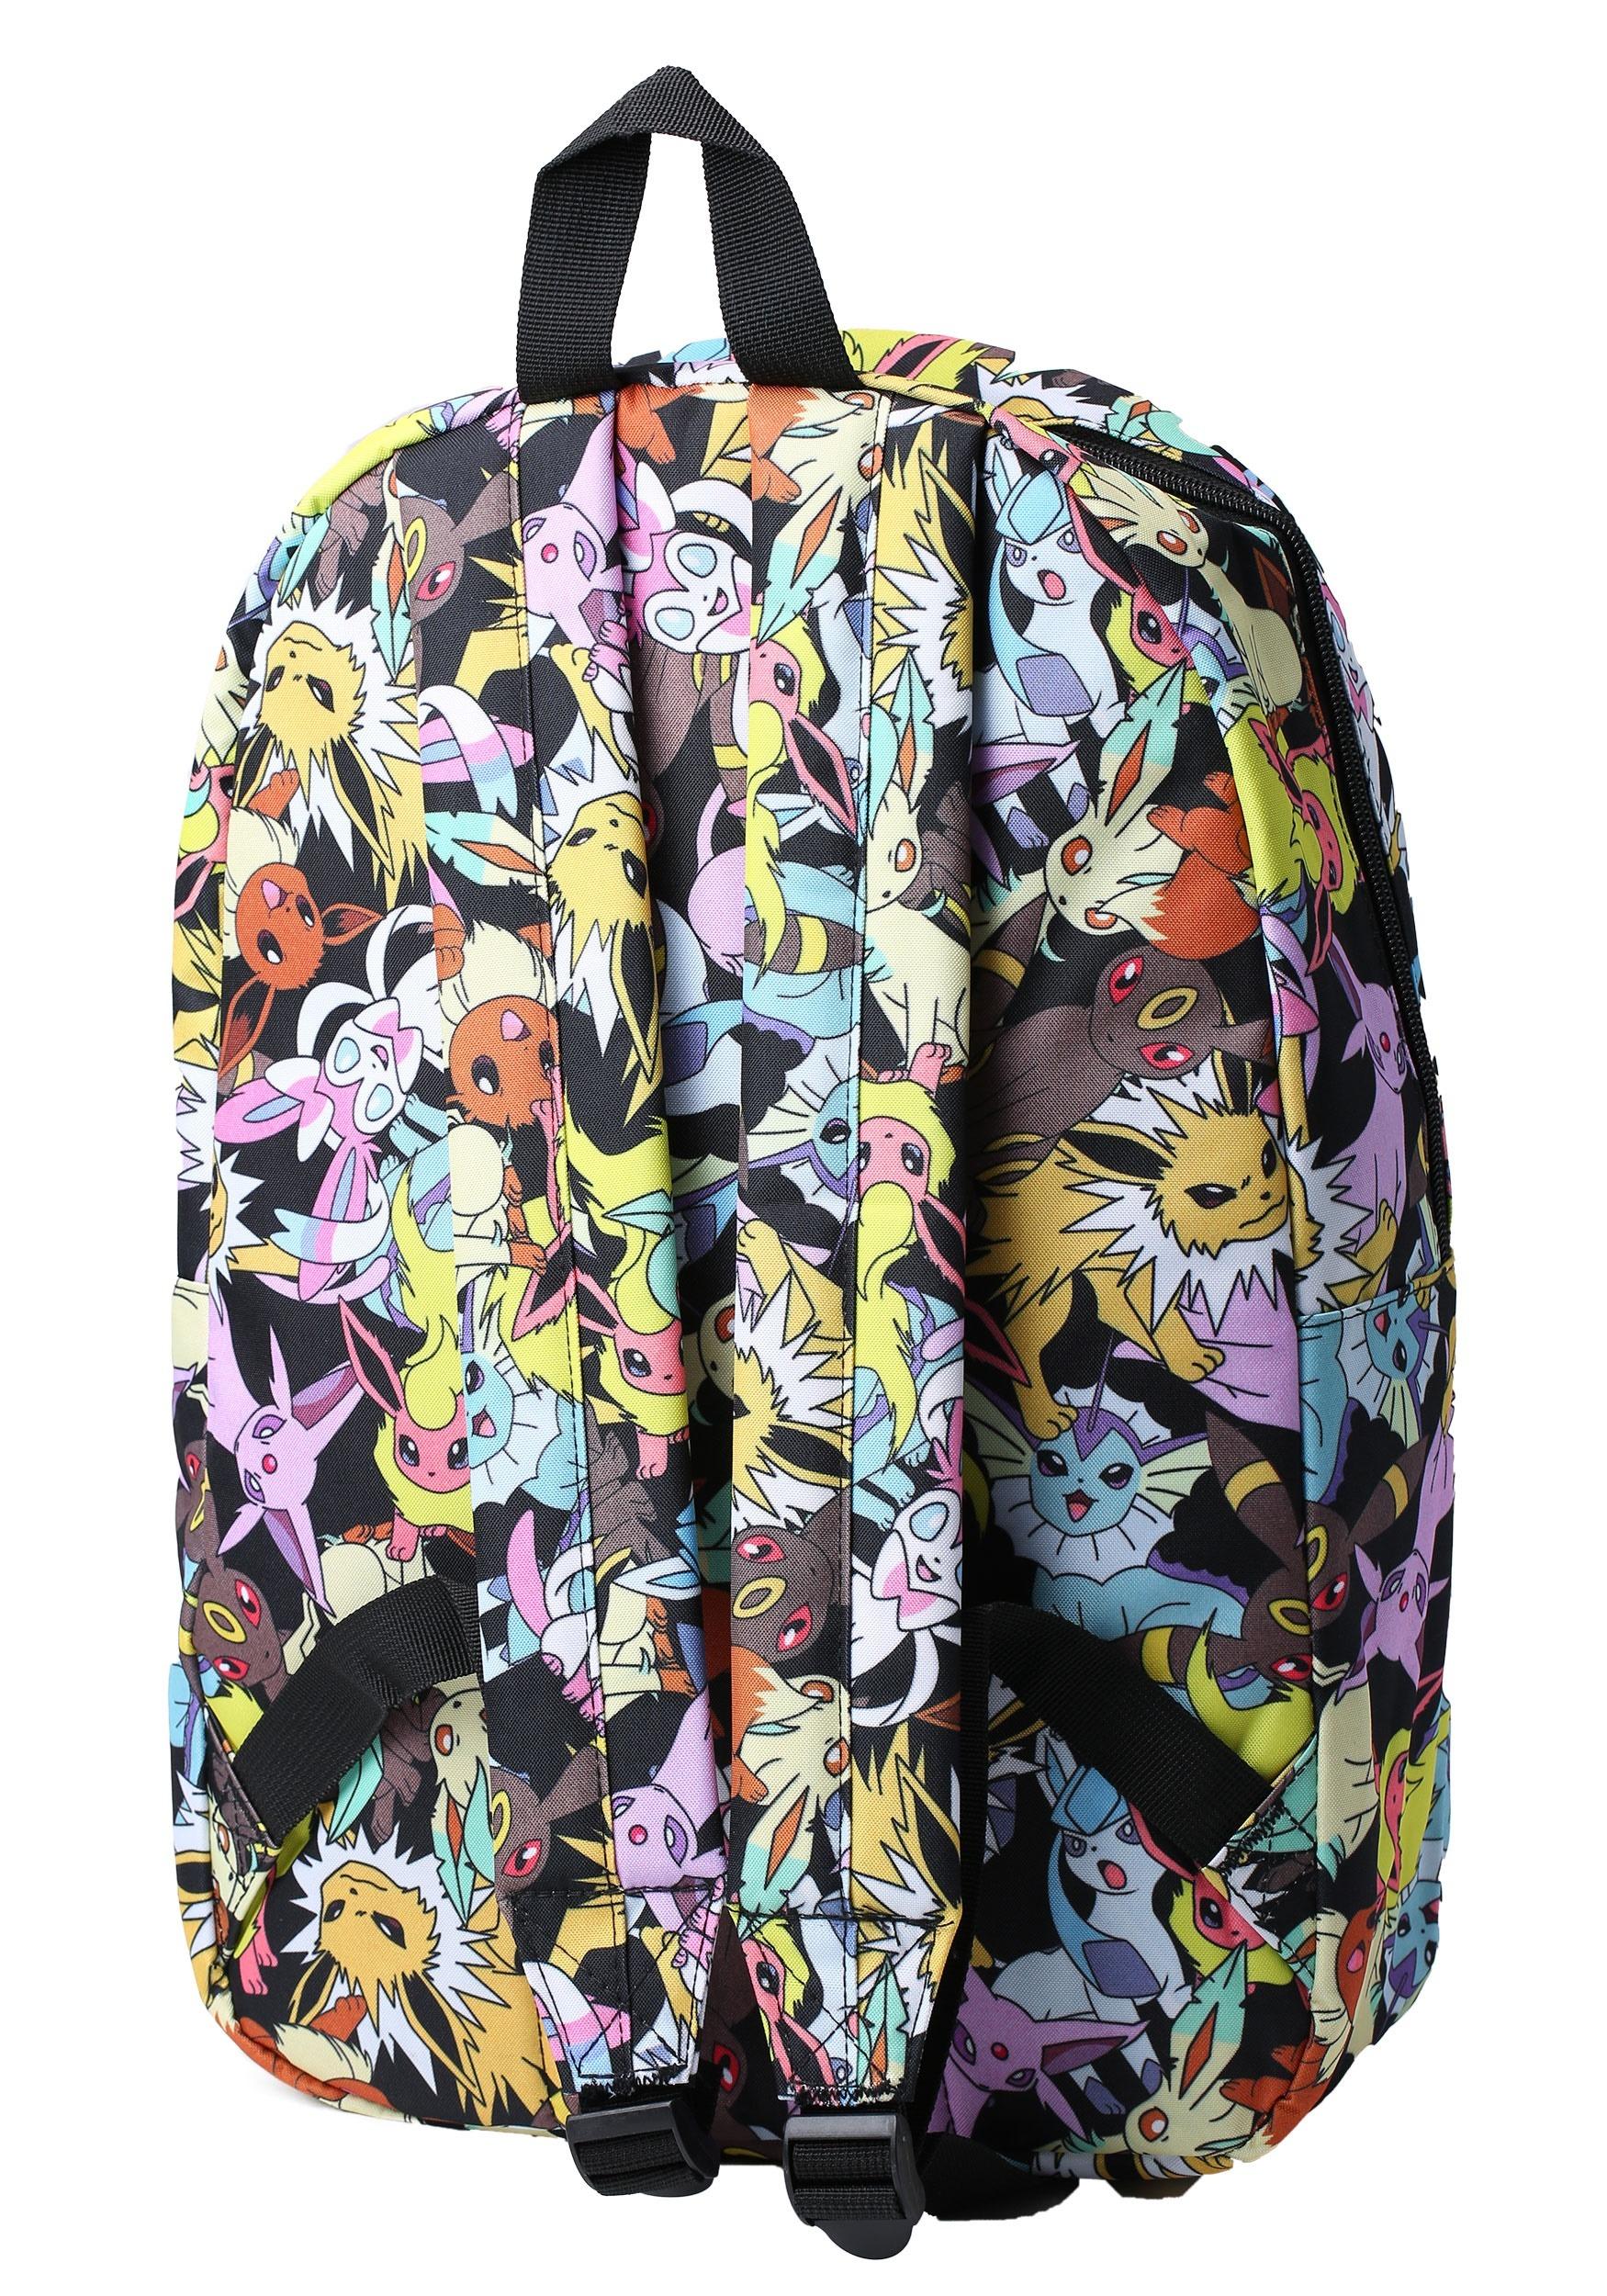 73cc7ae043f4 Pokemon Eevee Evolution All Over Print Backpack